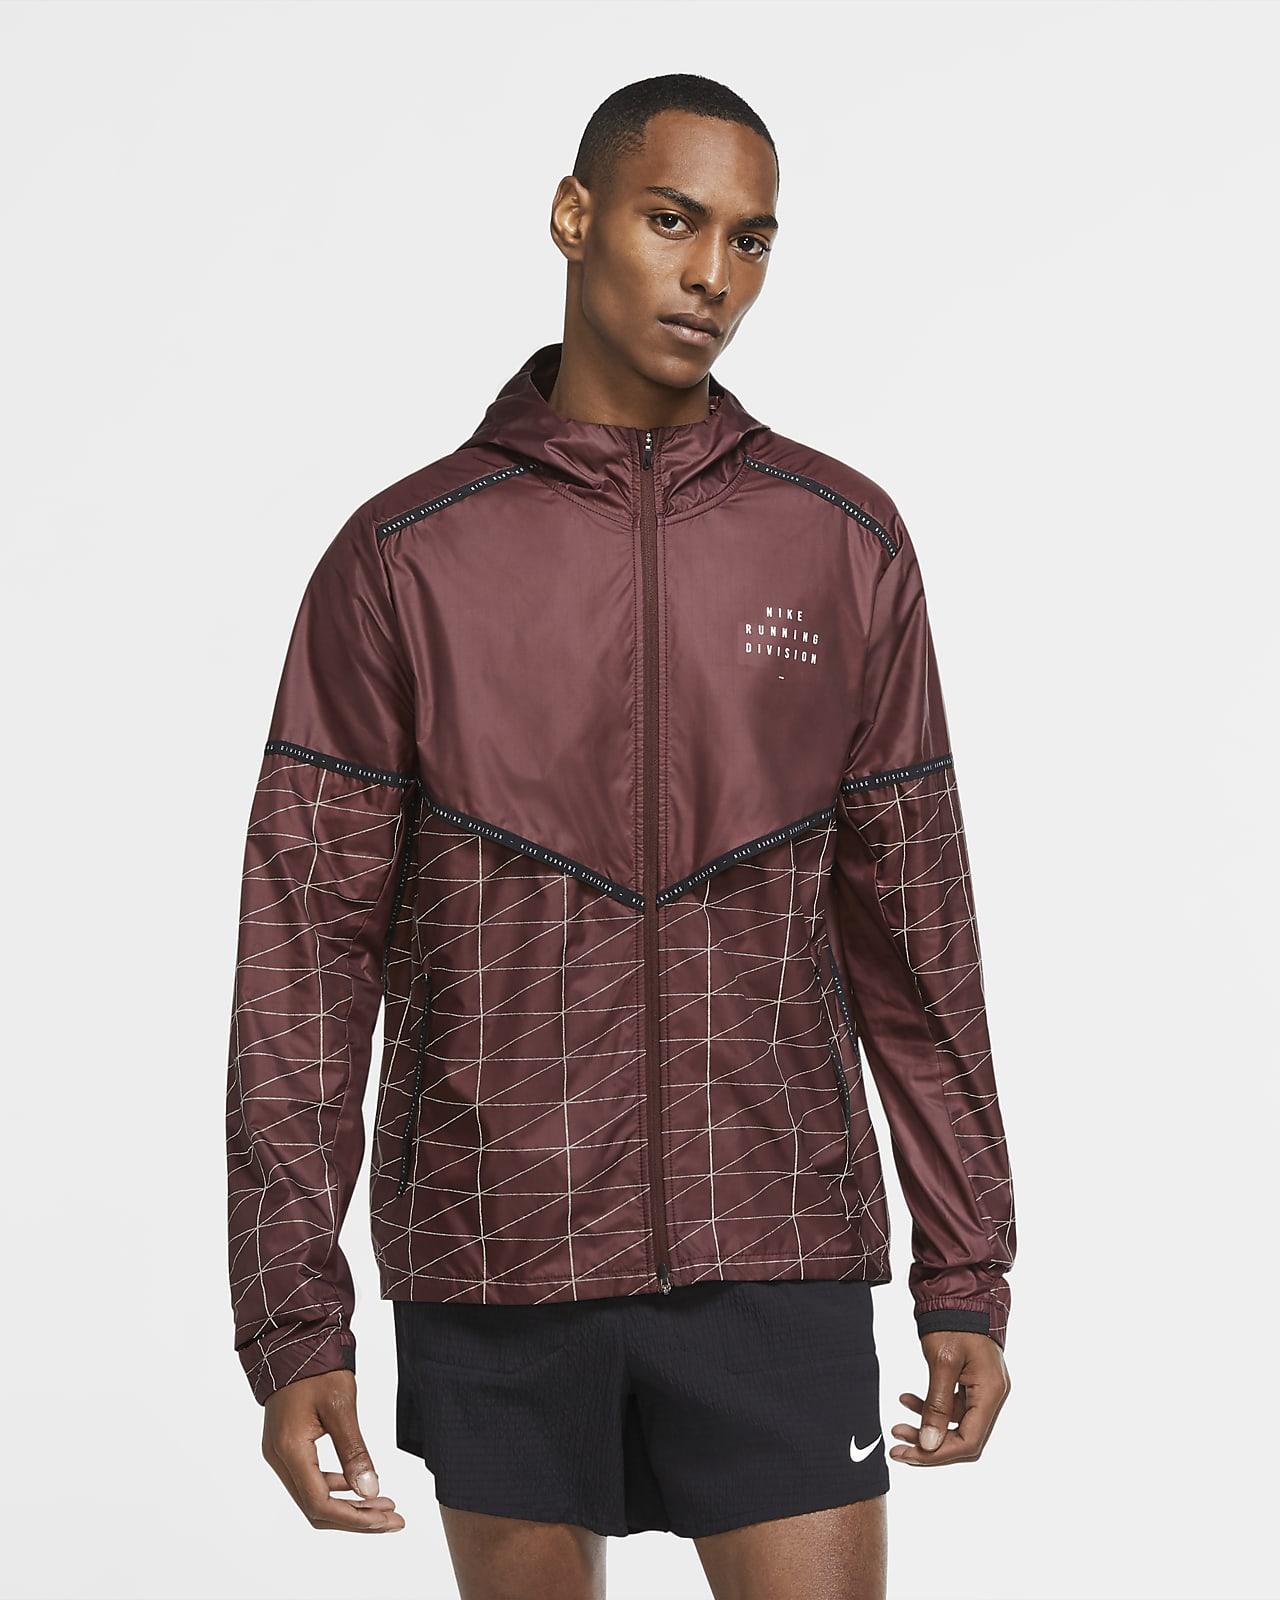 Nike Flash Run Division Men's Running Jacket